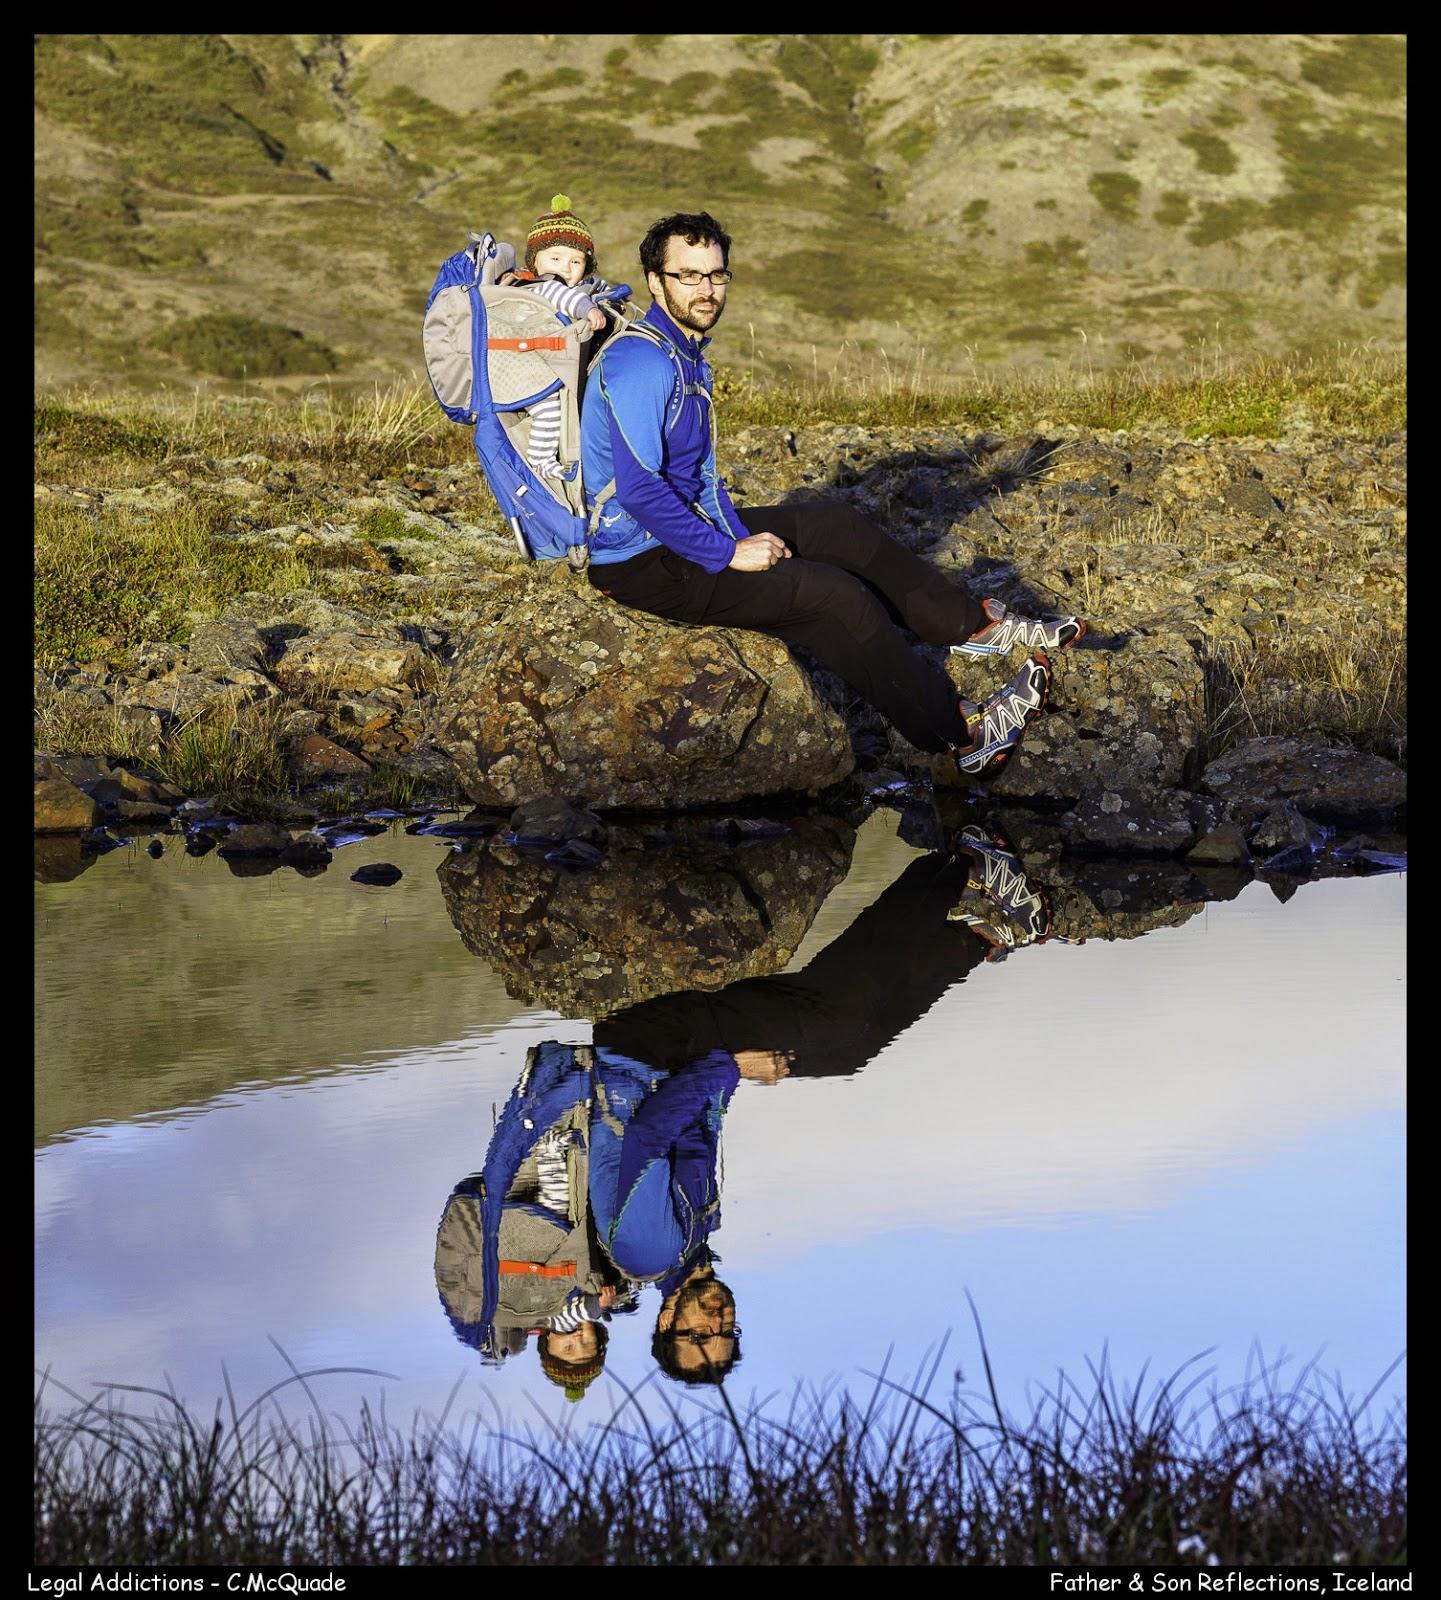 reflections%2Bme%2Band%2Bliam%2Biceland-20147355.jpg